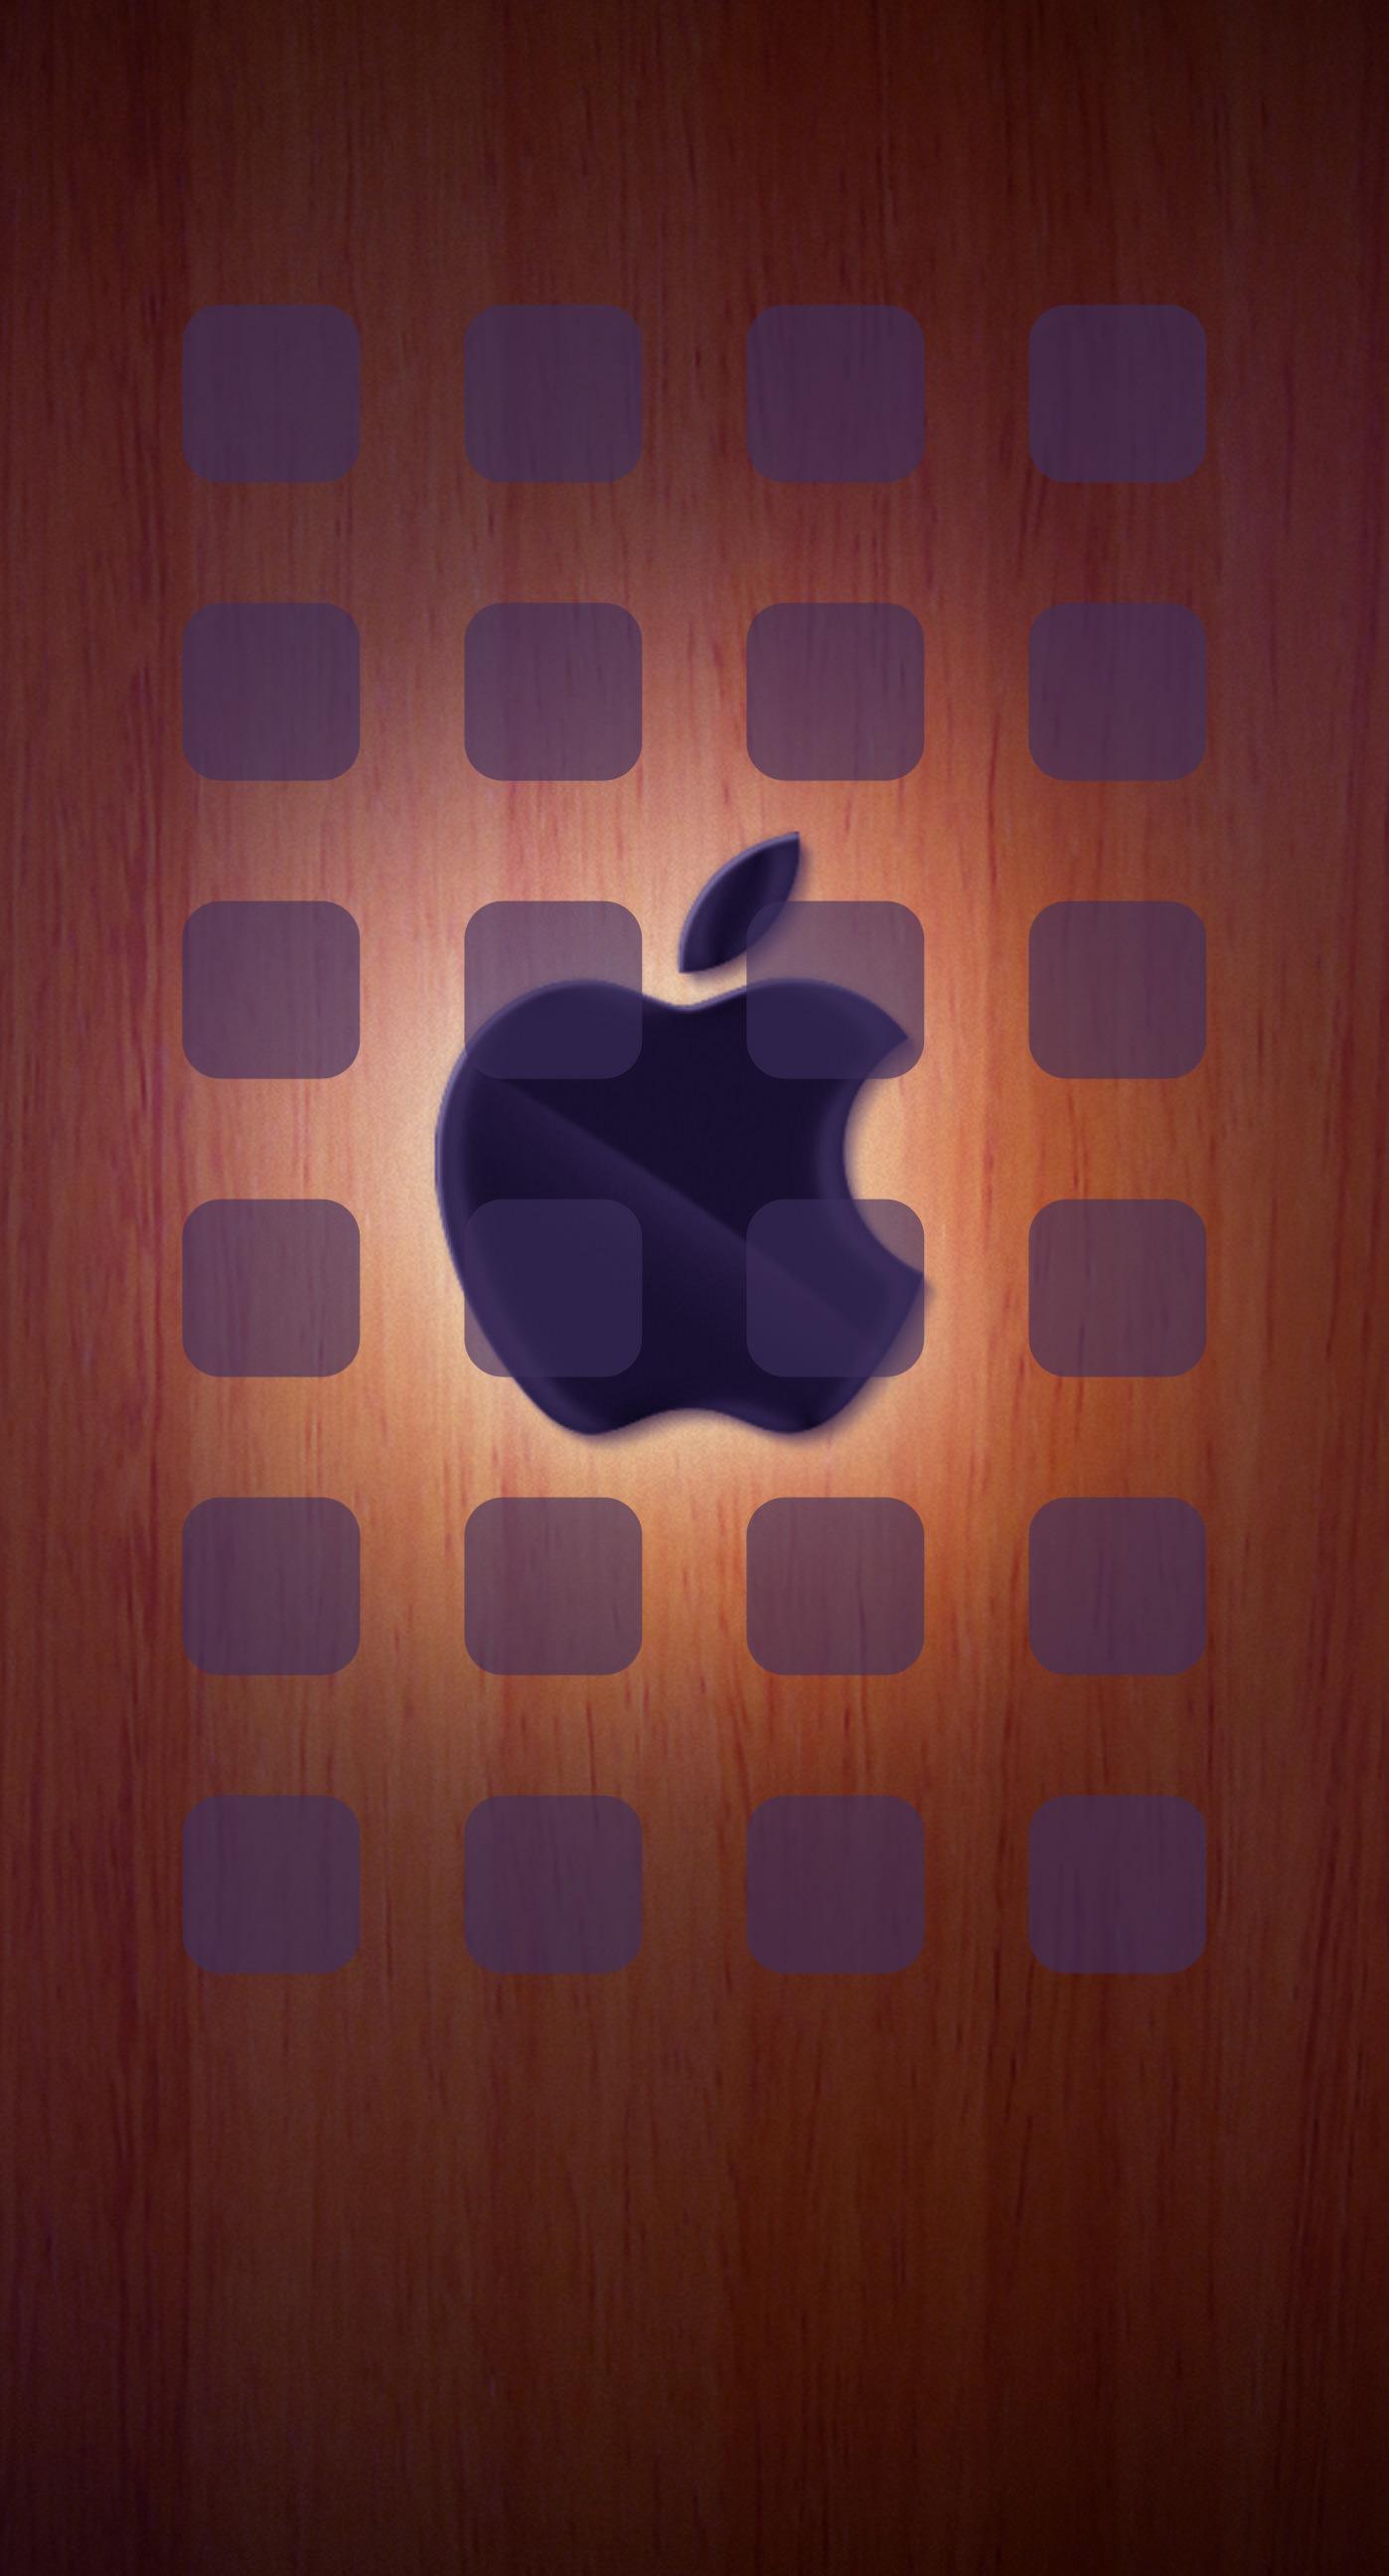 Appleロゴ棚クール板茶色 Wallpaper Sc Iphone7plus壁紙